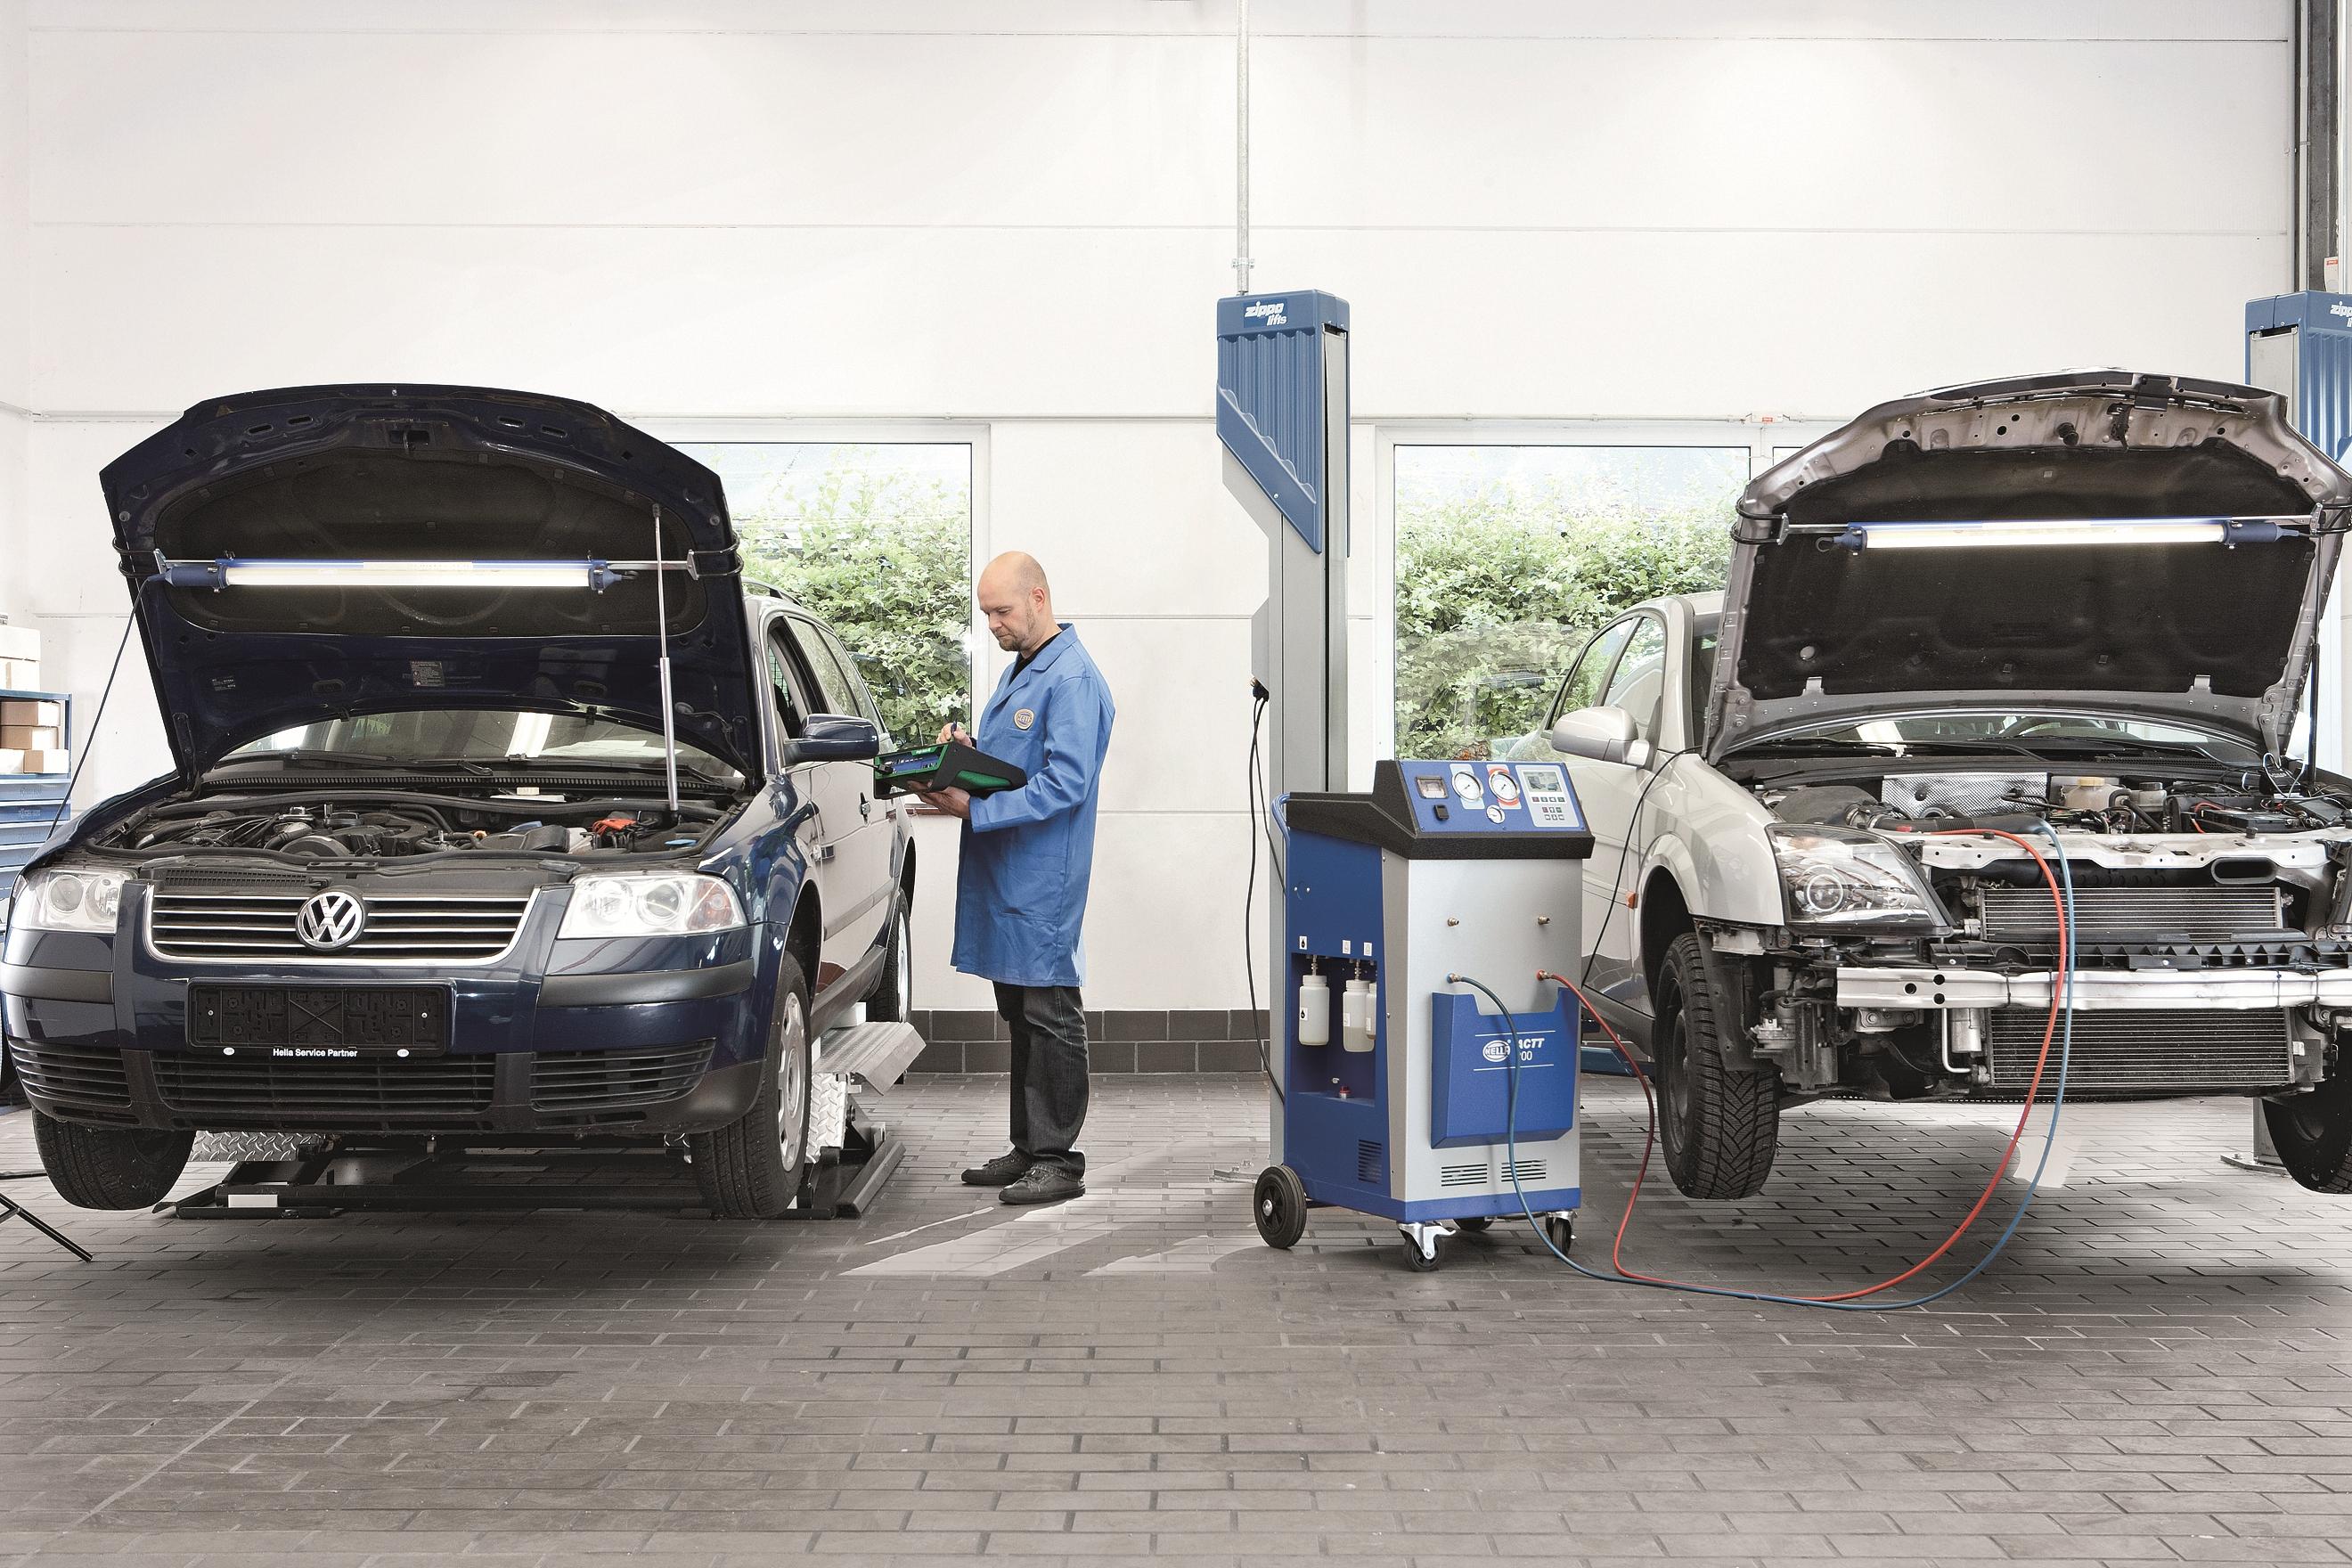 Garage Services Hella 7642 Vehicle Diagnostics At The Photo